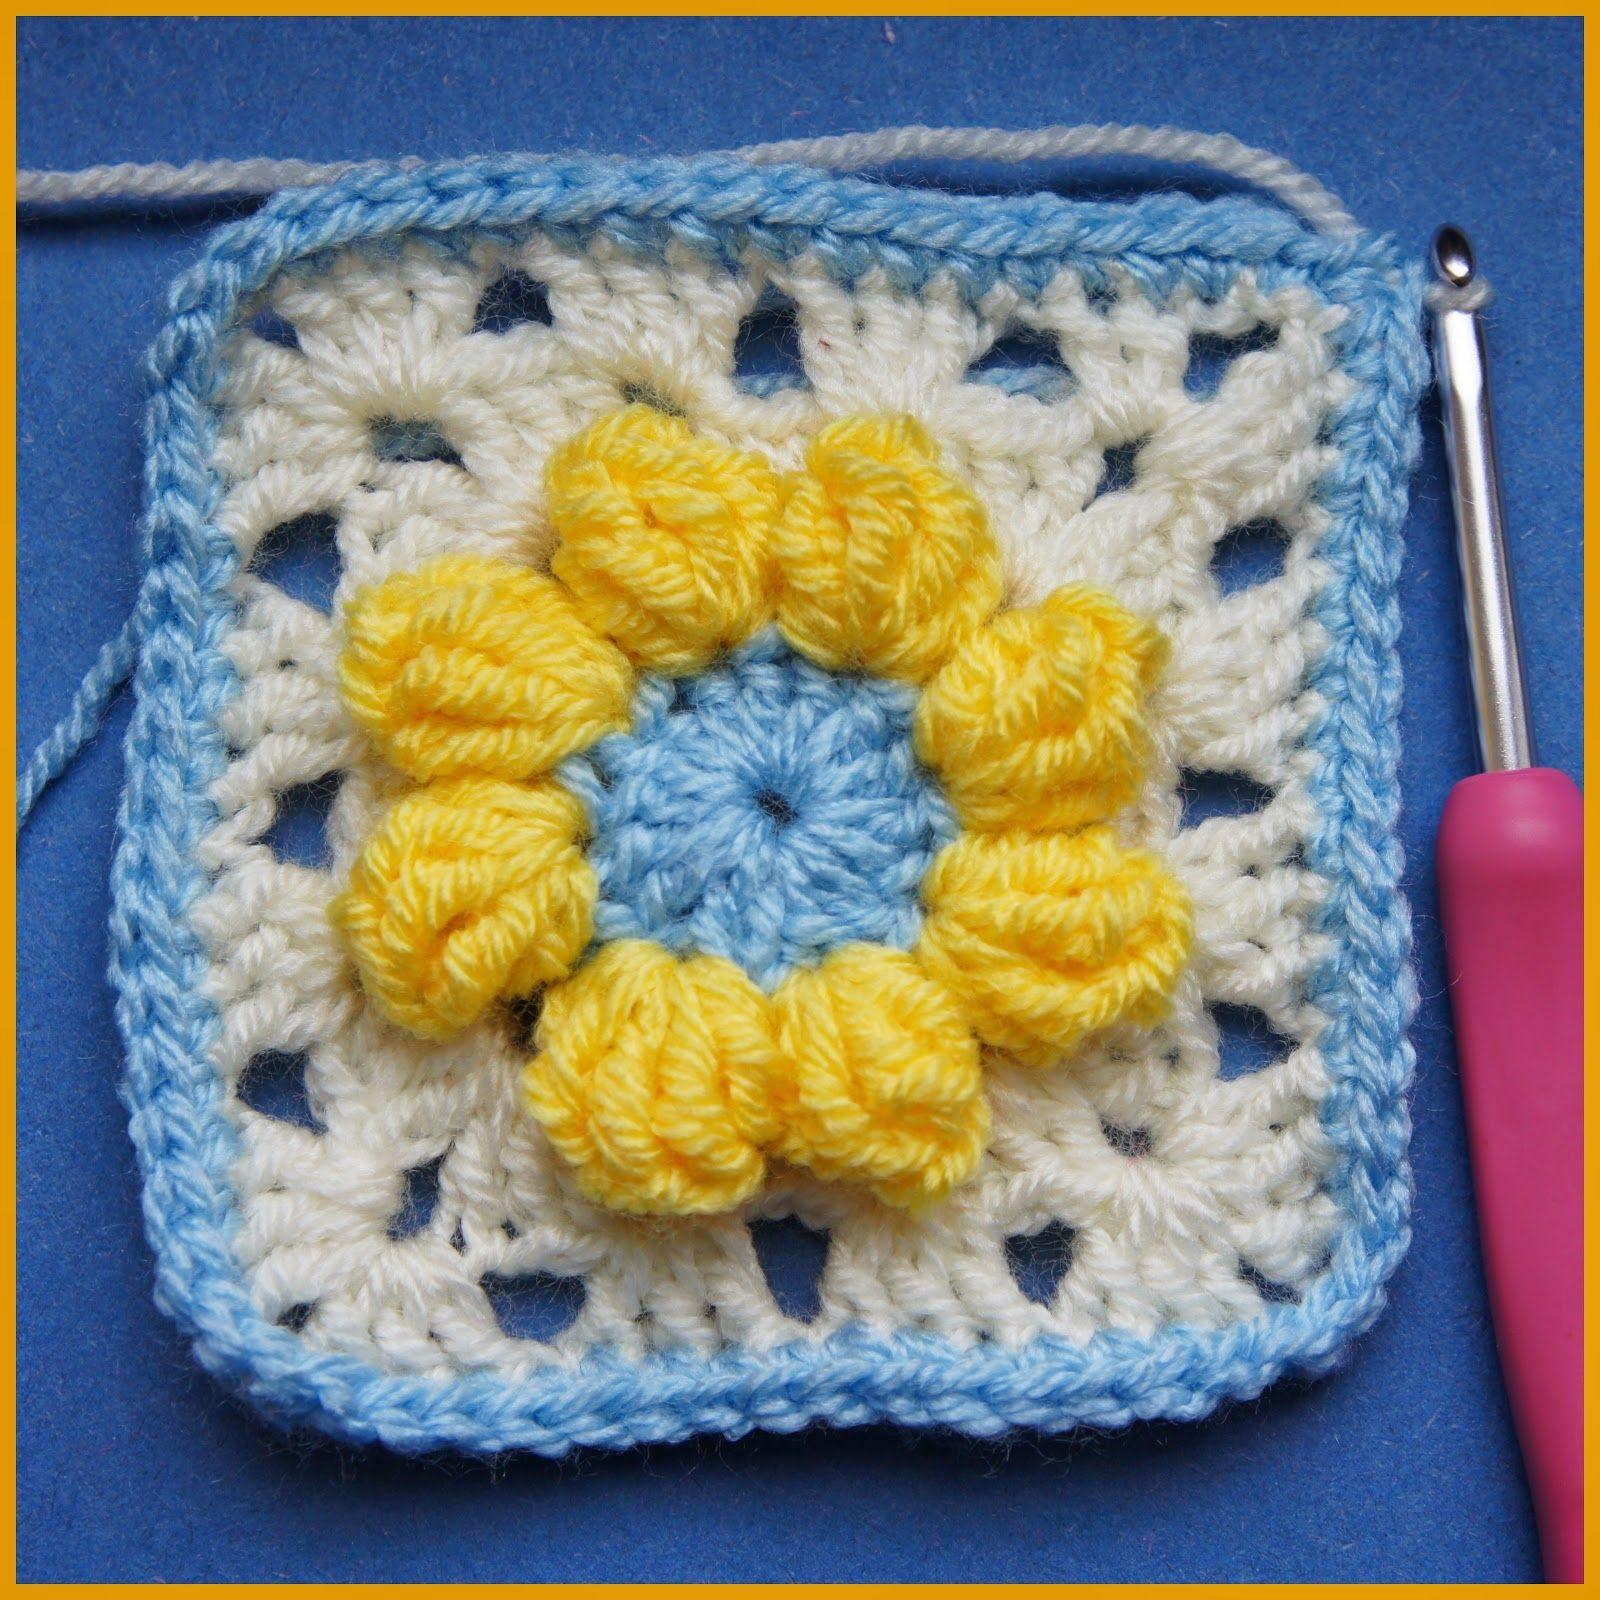 Pin By Monica Jackson On Crafts Crochet Crochet Granny Crochet